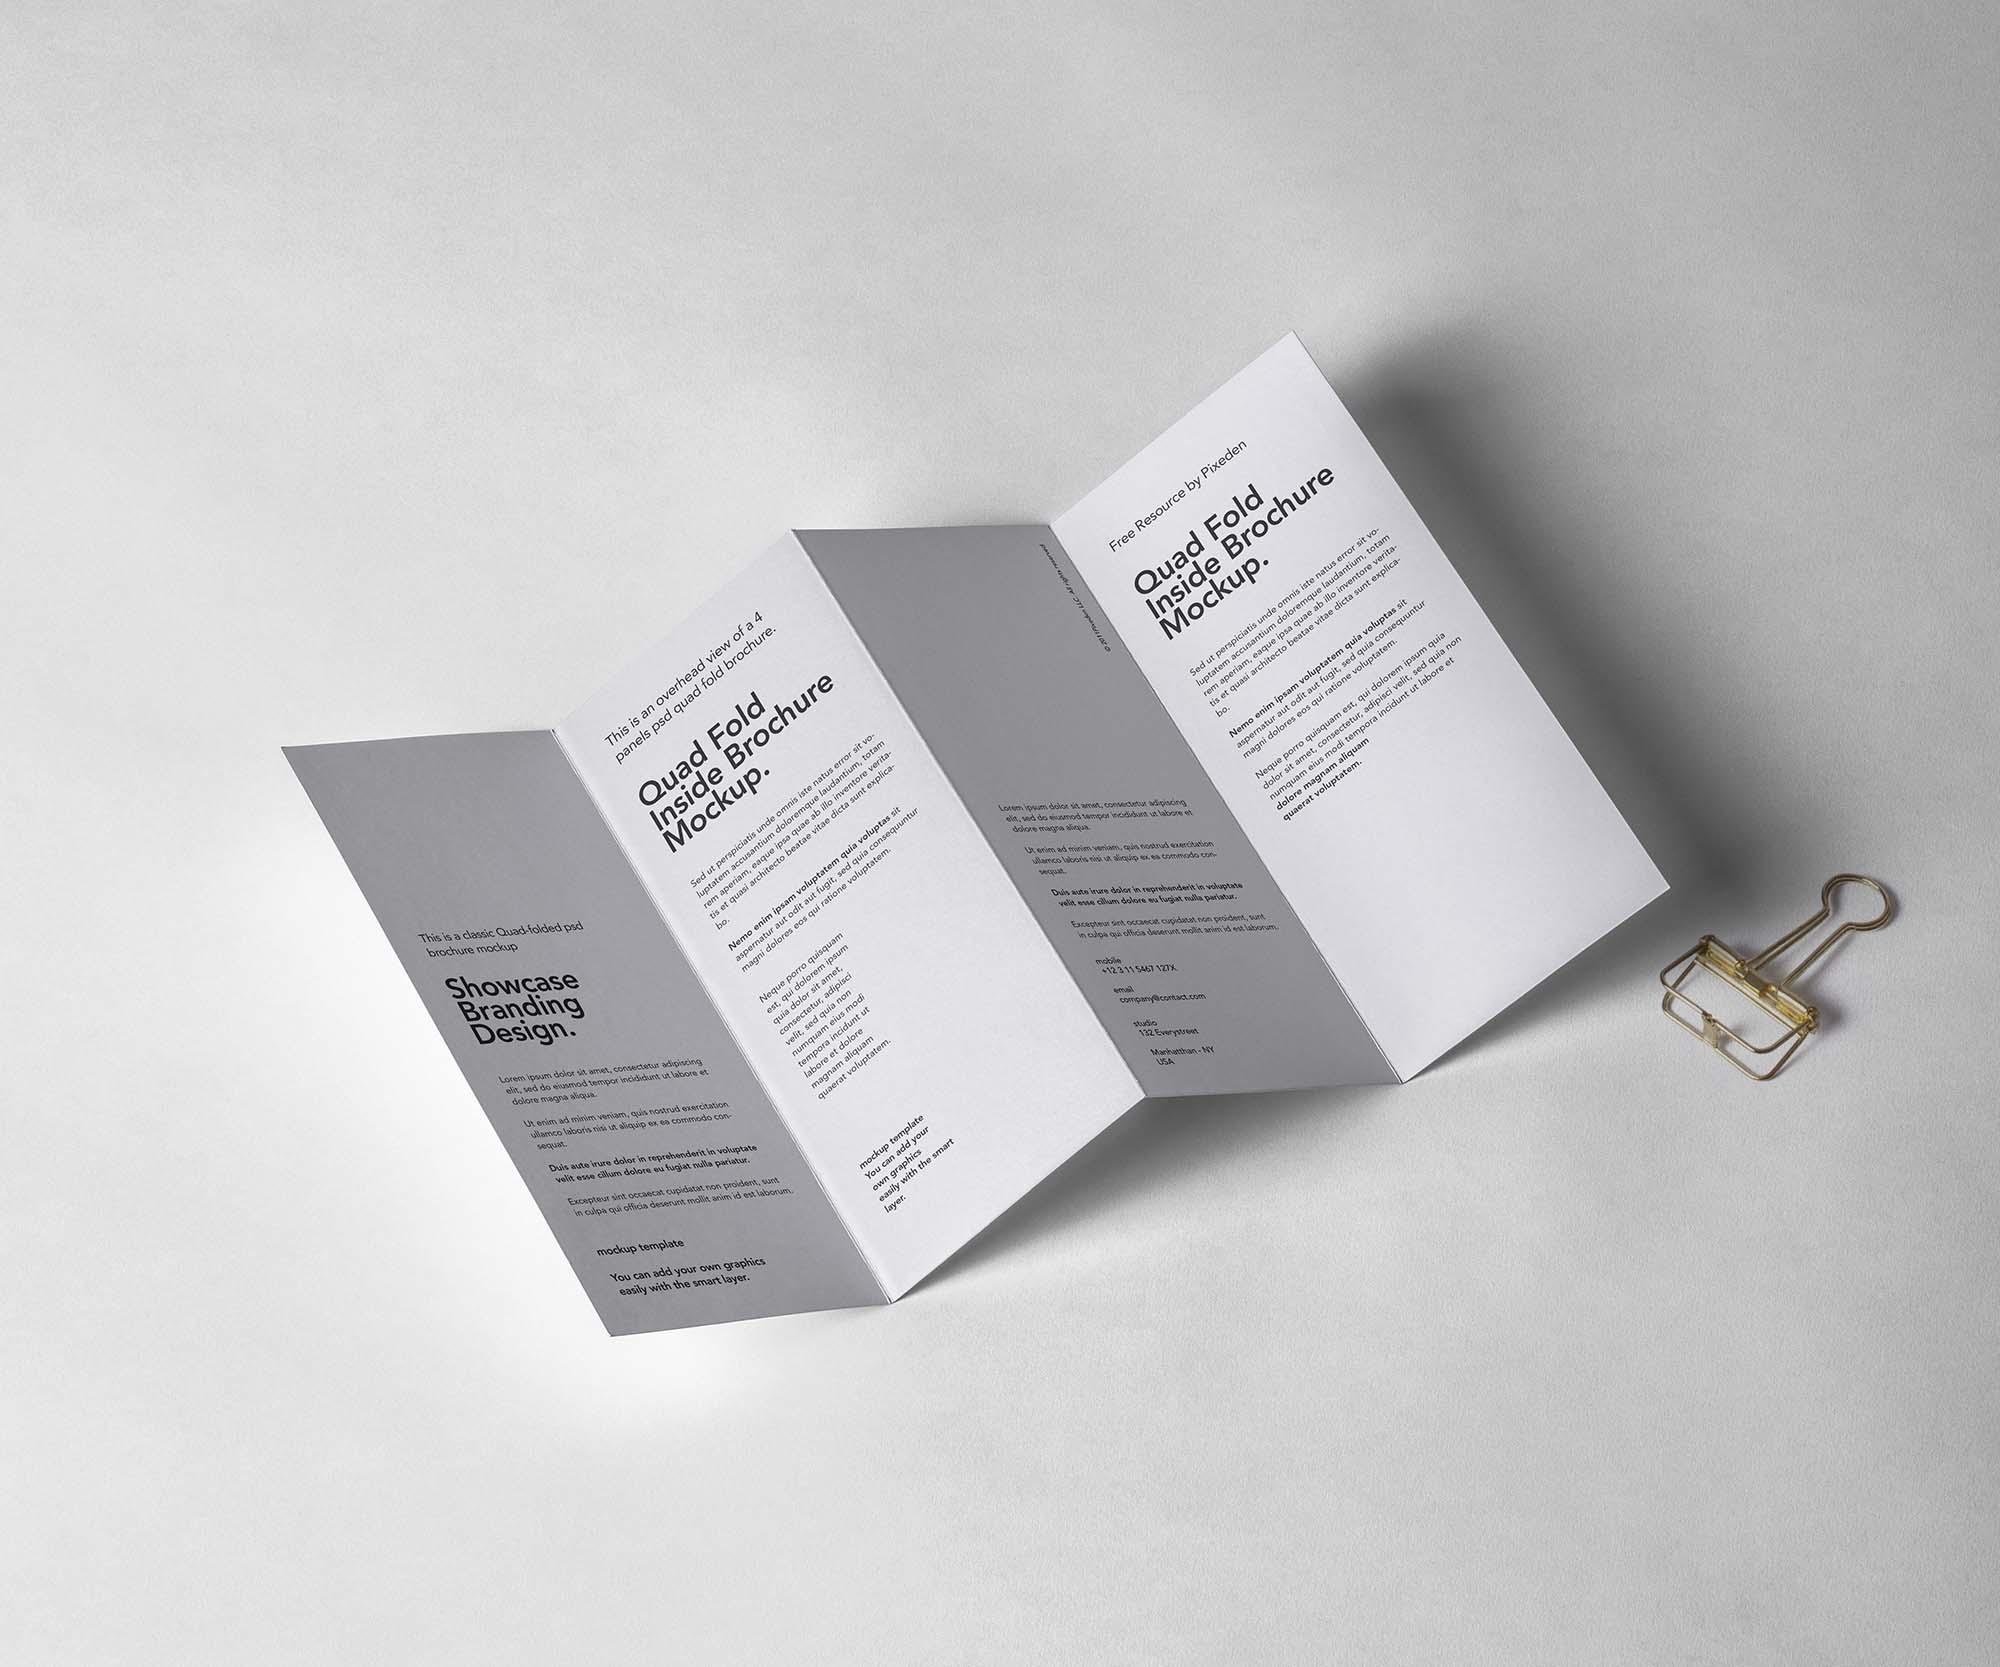 4 Fold Inside Brochure Mockup